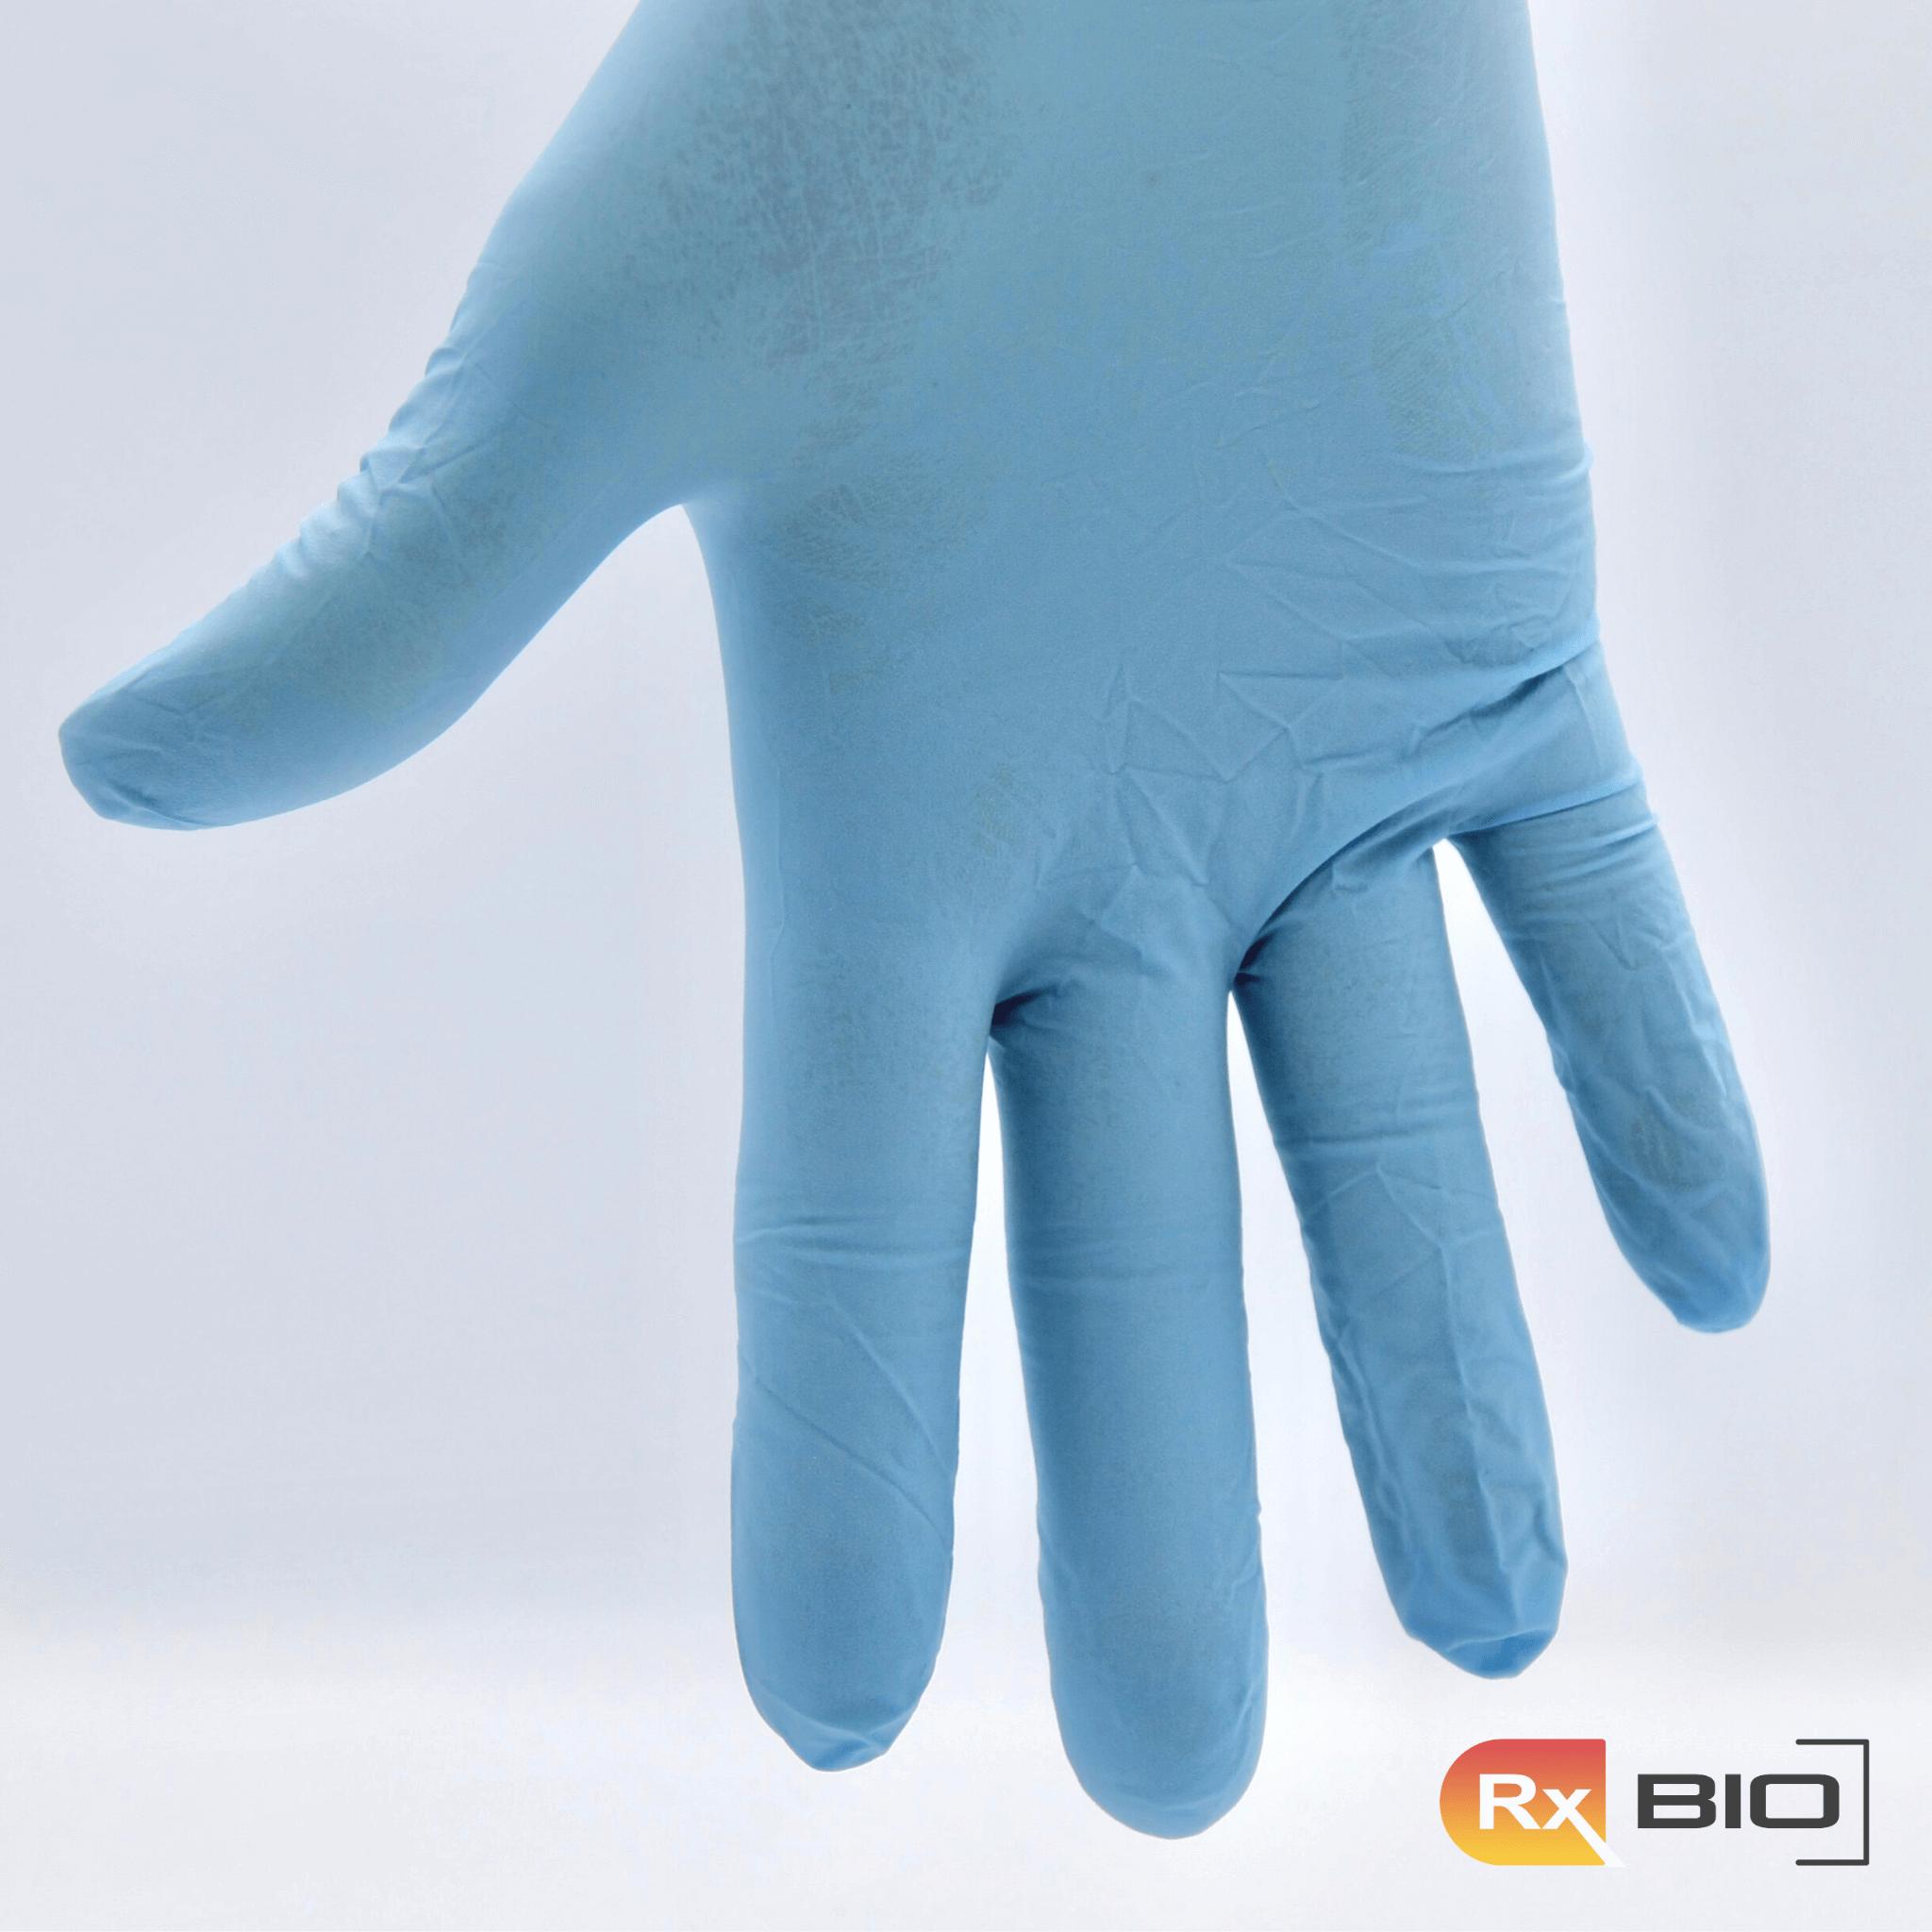 Medical + Non-Medical Grade Nitrile Gloves